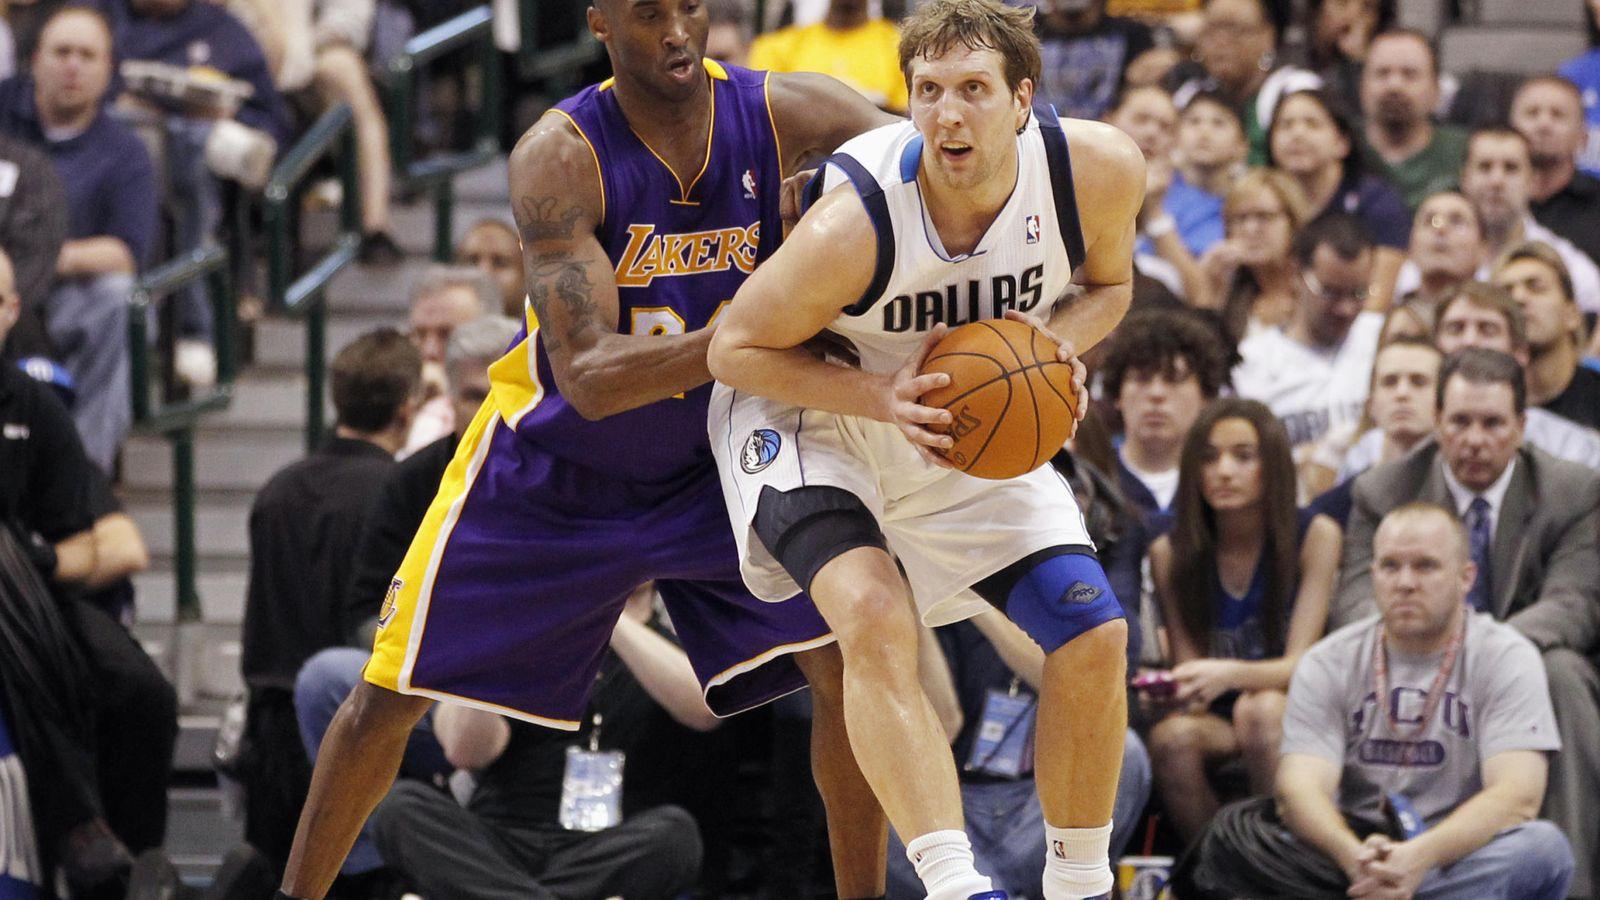 Foto: Bryant llegó a la NBA en 1996 y Nowitzki, en 1998 (Mike Stone/Reuters)